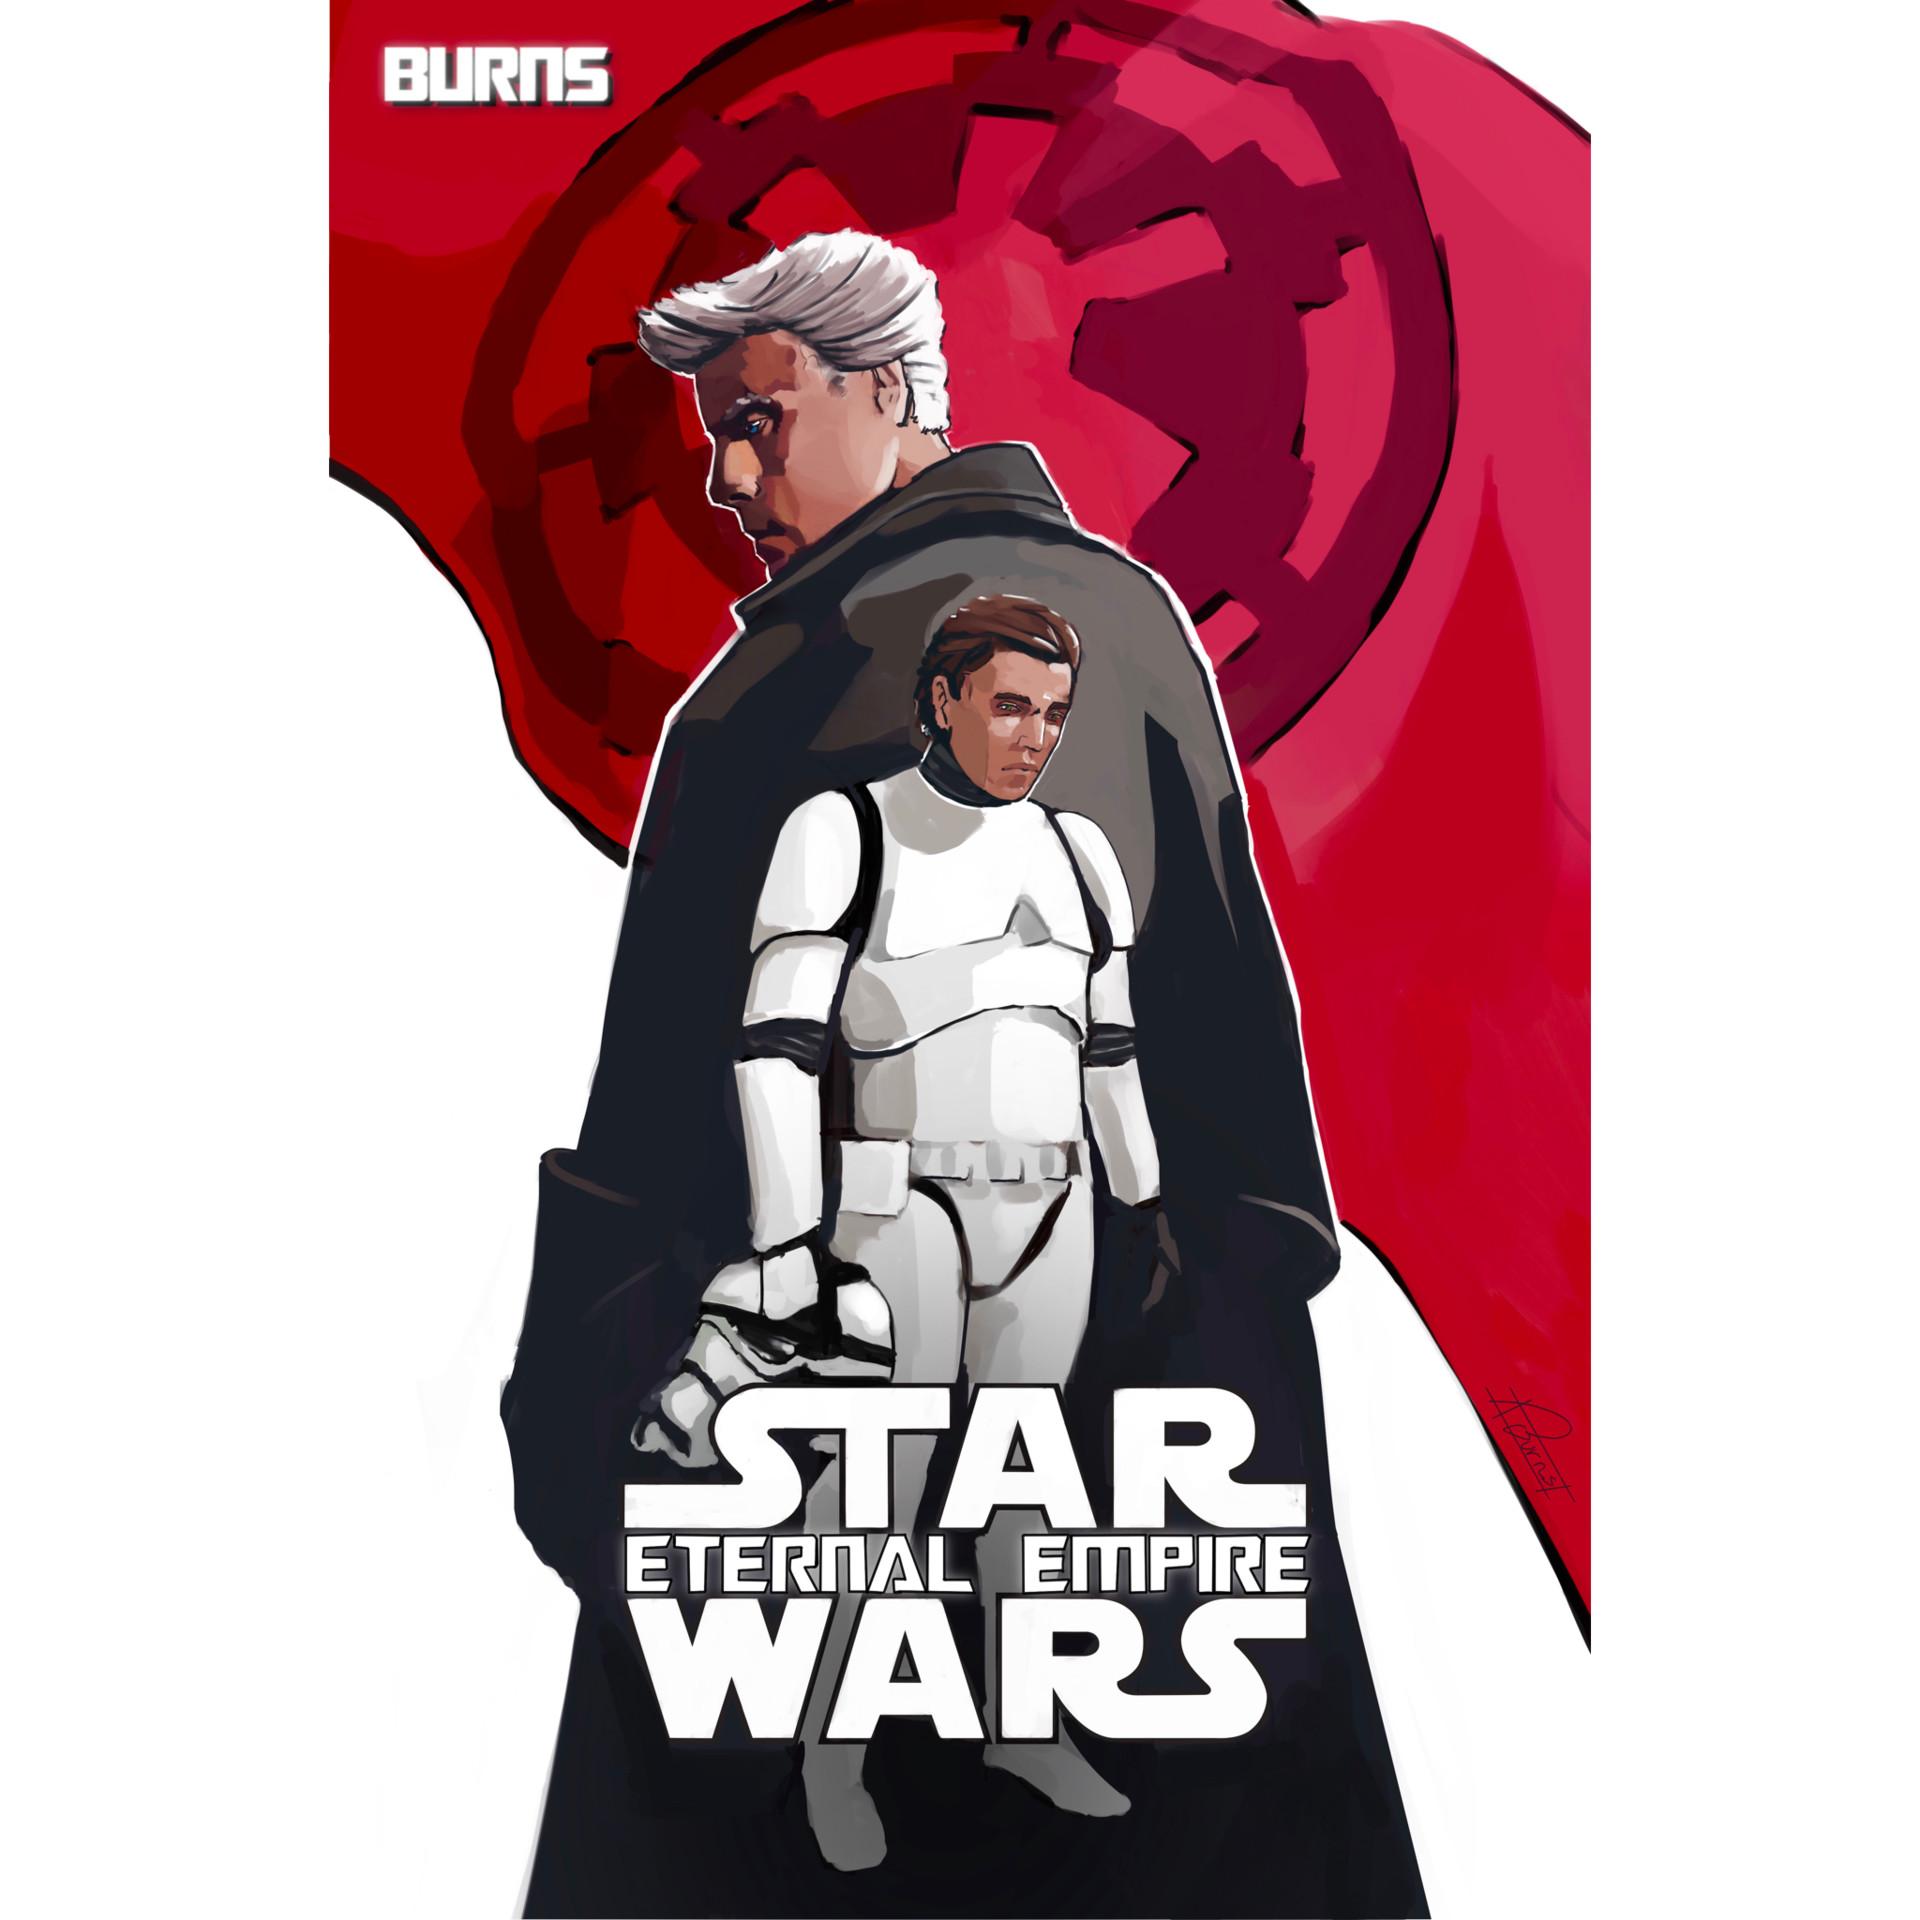 Star Wars: Eternal Empire #1 cover